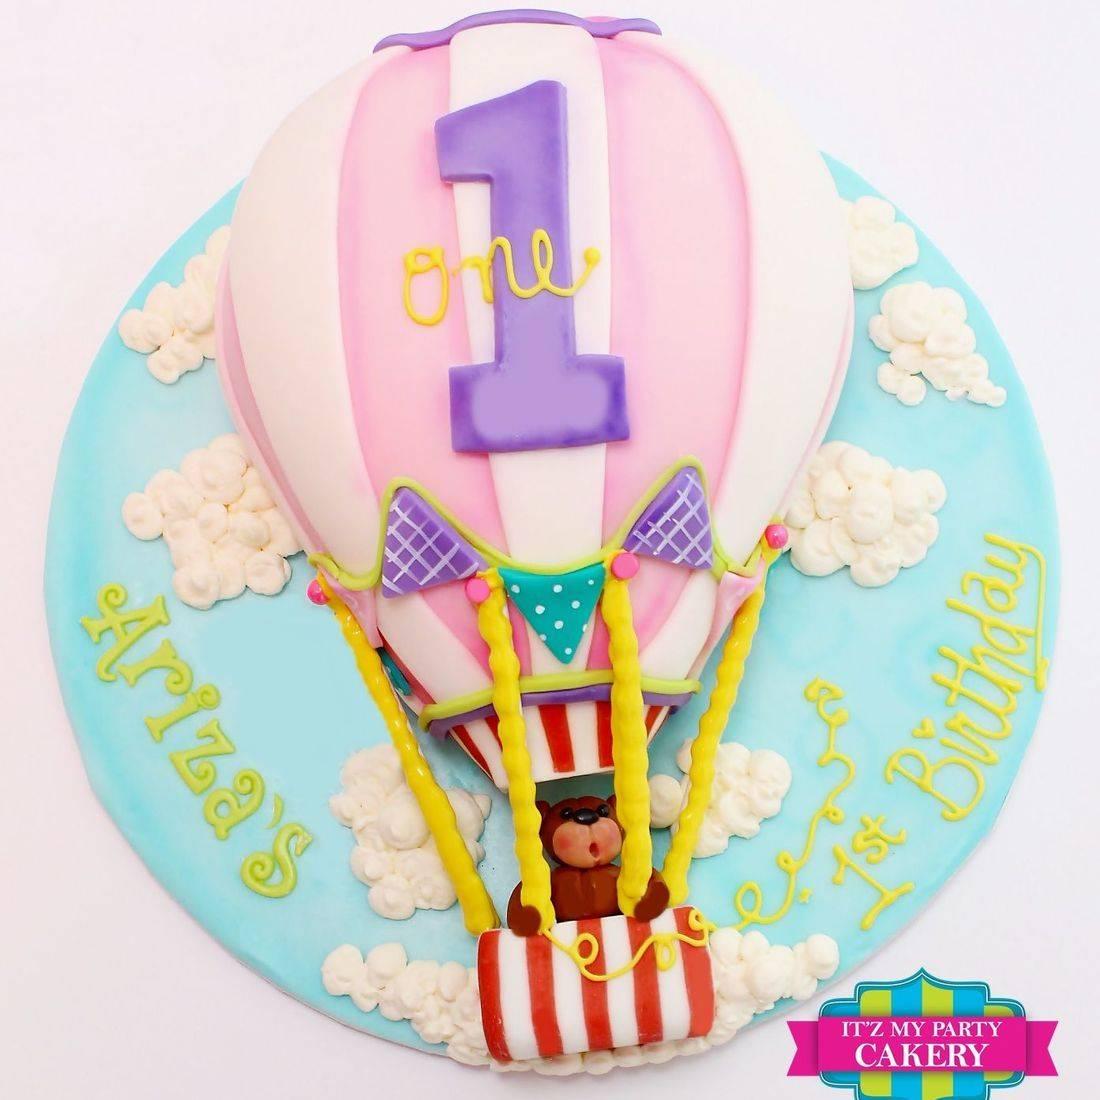 Hot Air Balloon Teddy Bear Cake Dimensional Cake Milwaukee